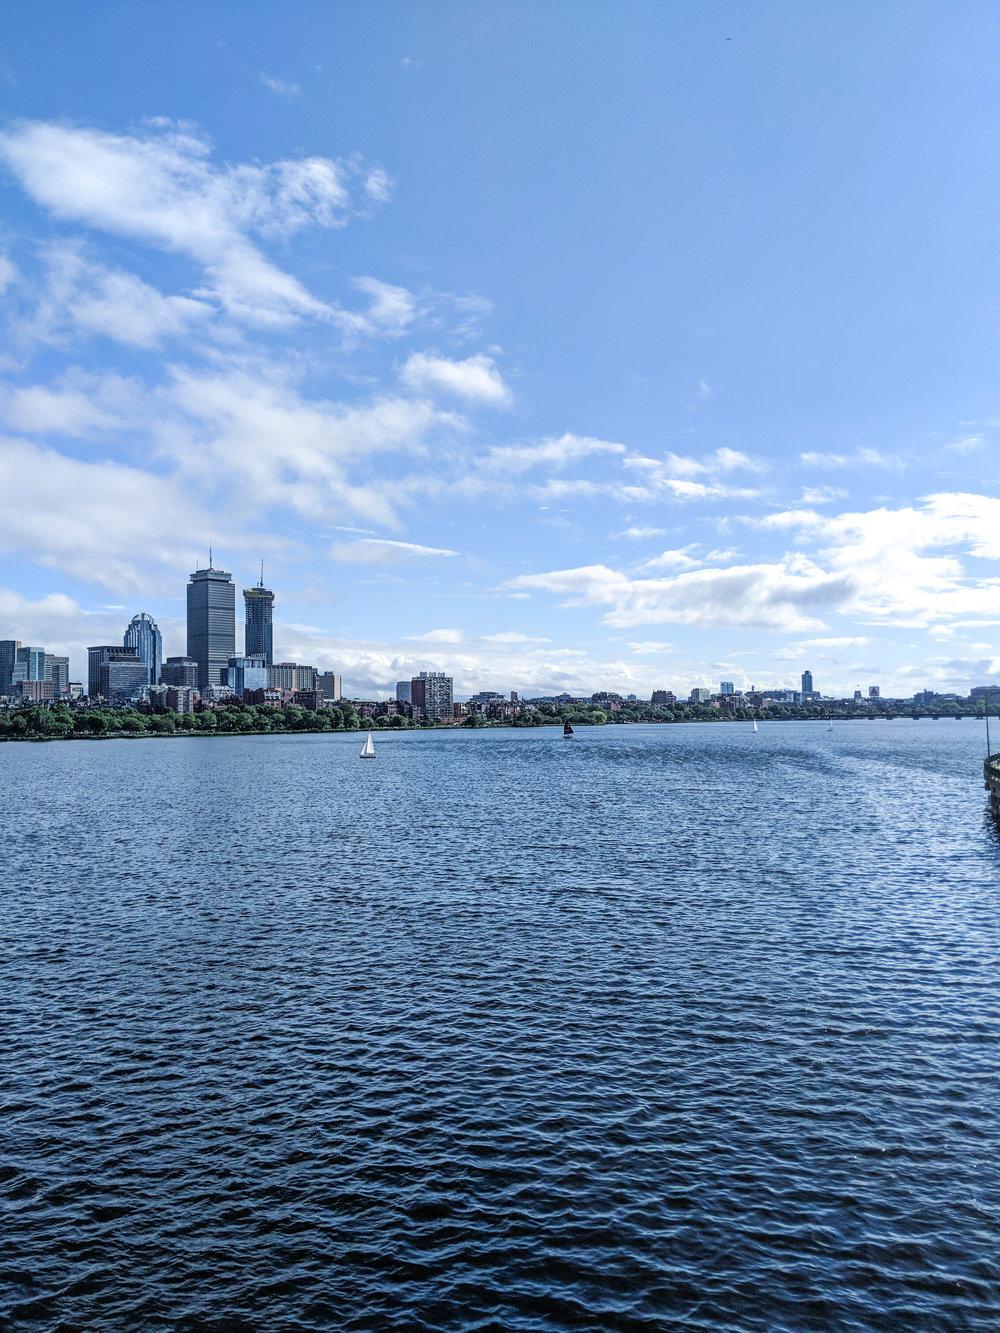 bri rinehart; boston; photography; skyline